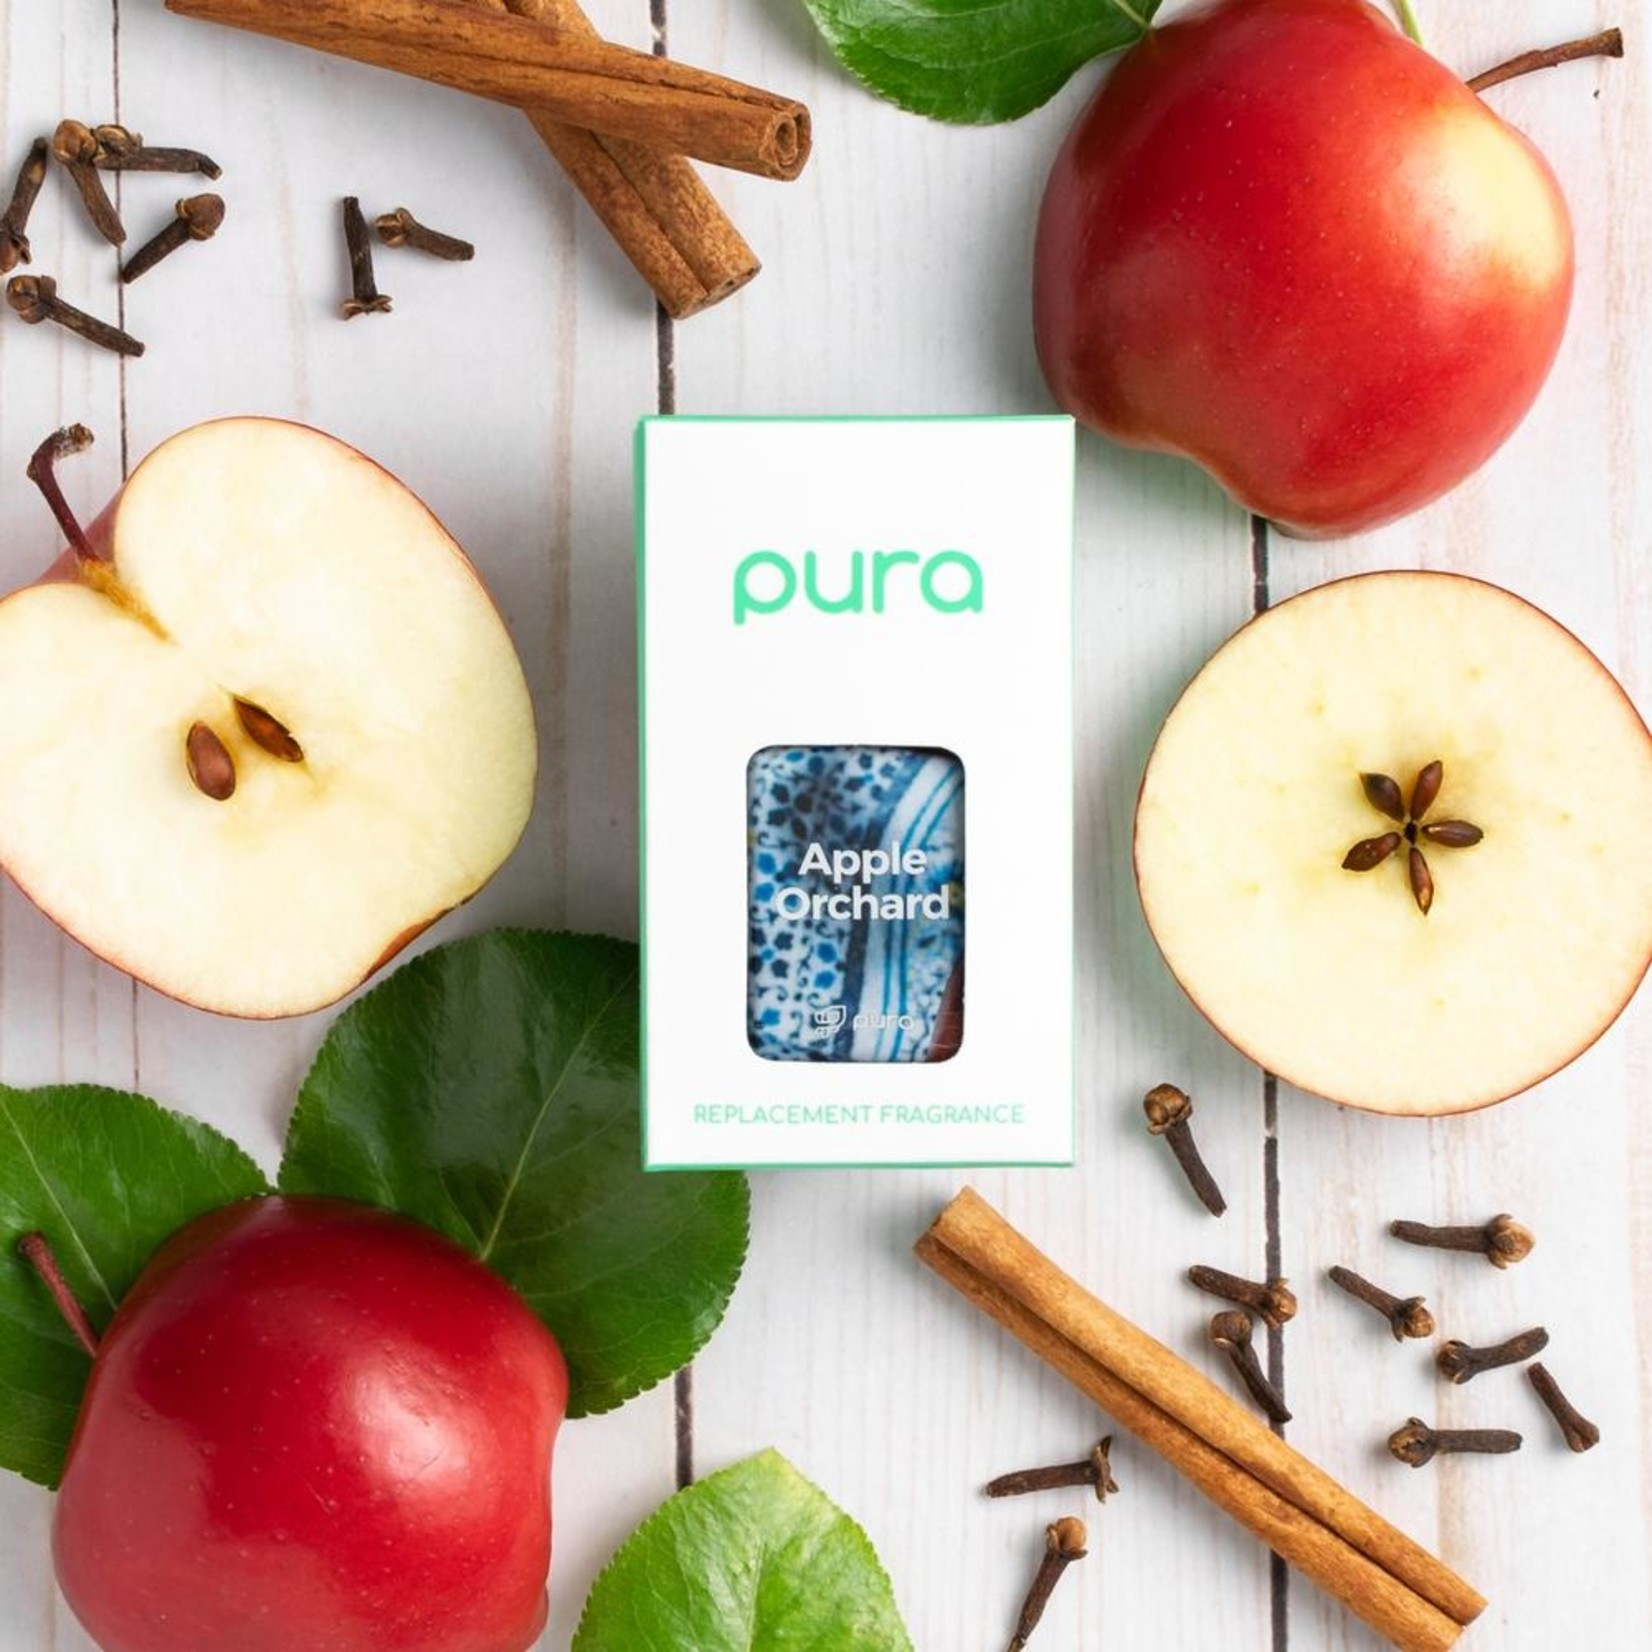 Pura Apple Orchards Pura Fragrance